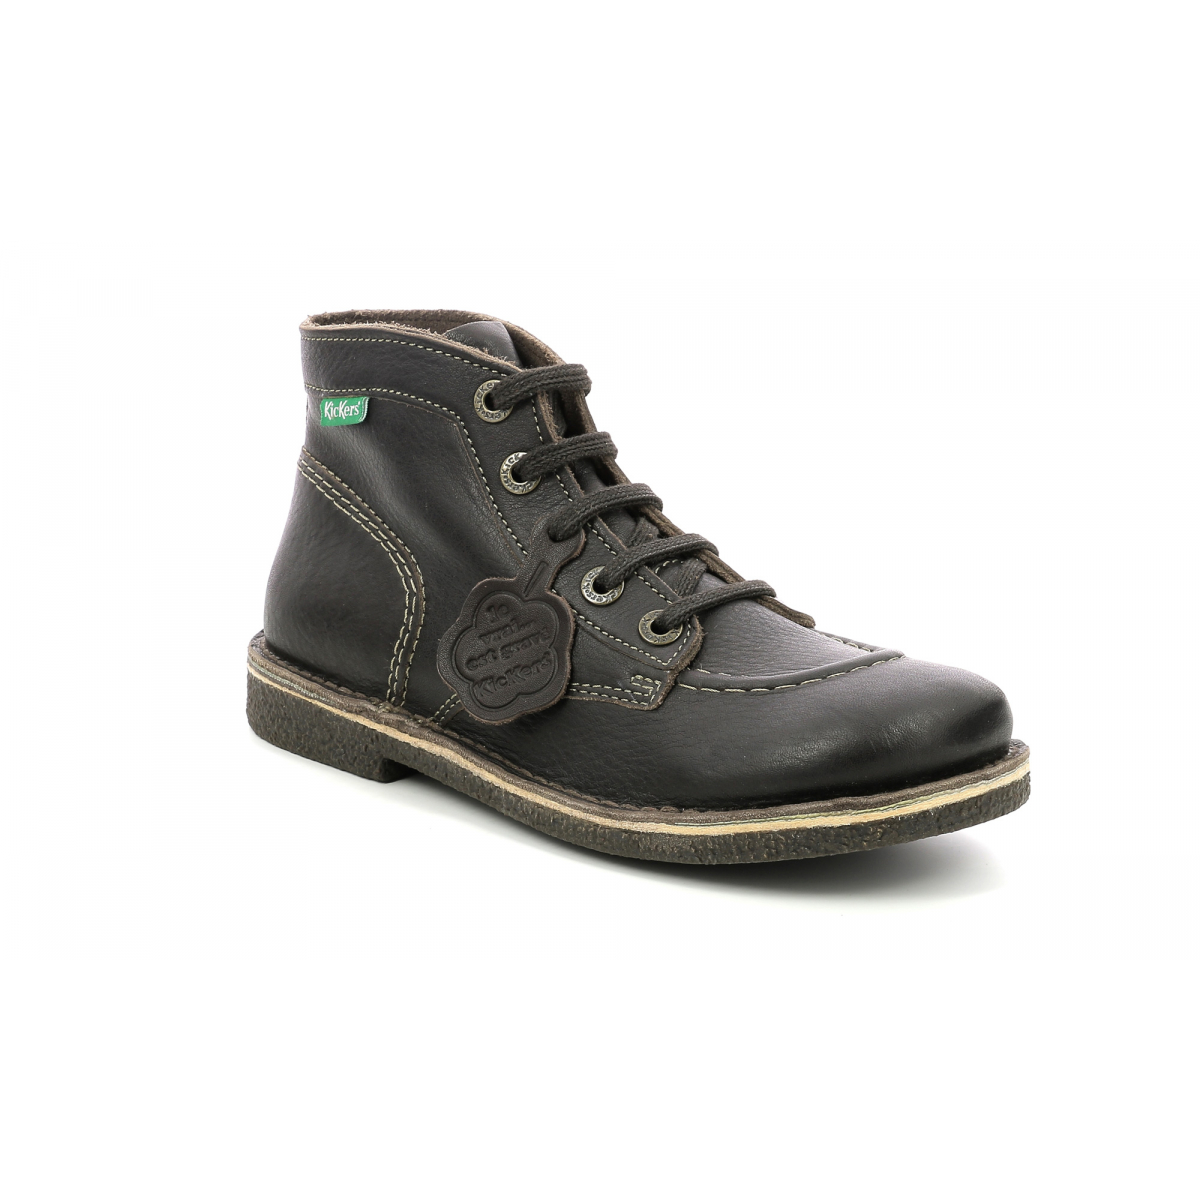 6ac80d2fe8e0f0 Chaussures Femme LEGENDIKNEW MARRON FONC SEMELLE MAR PERM - Kickers